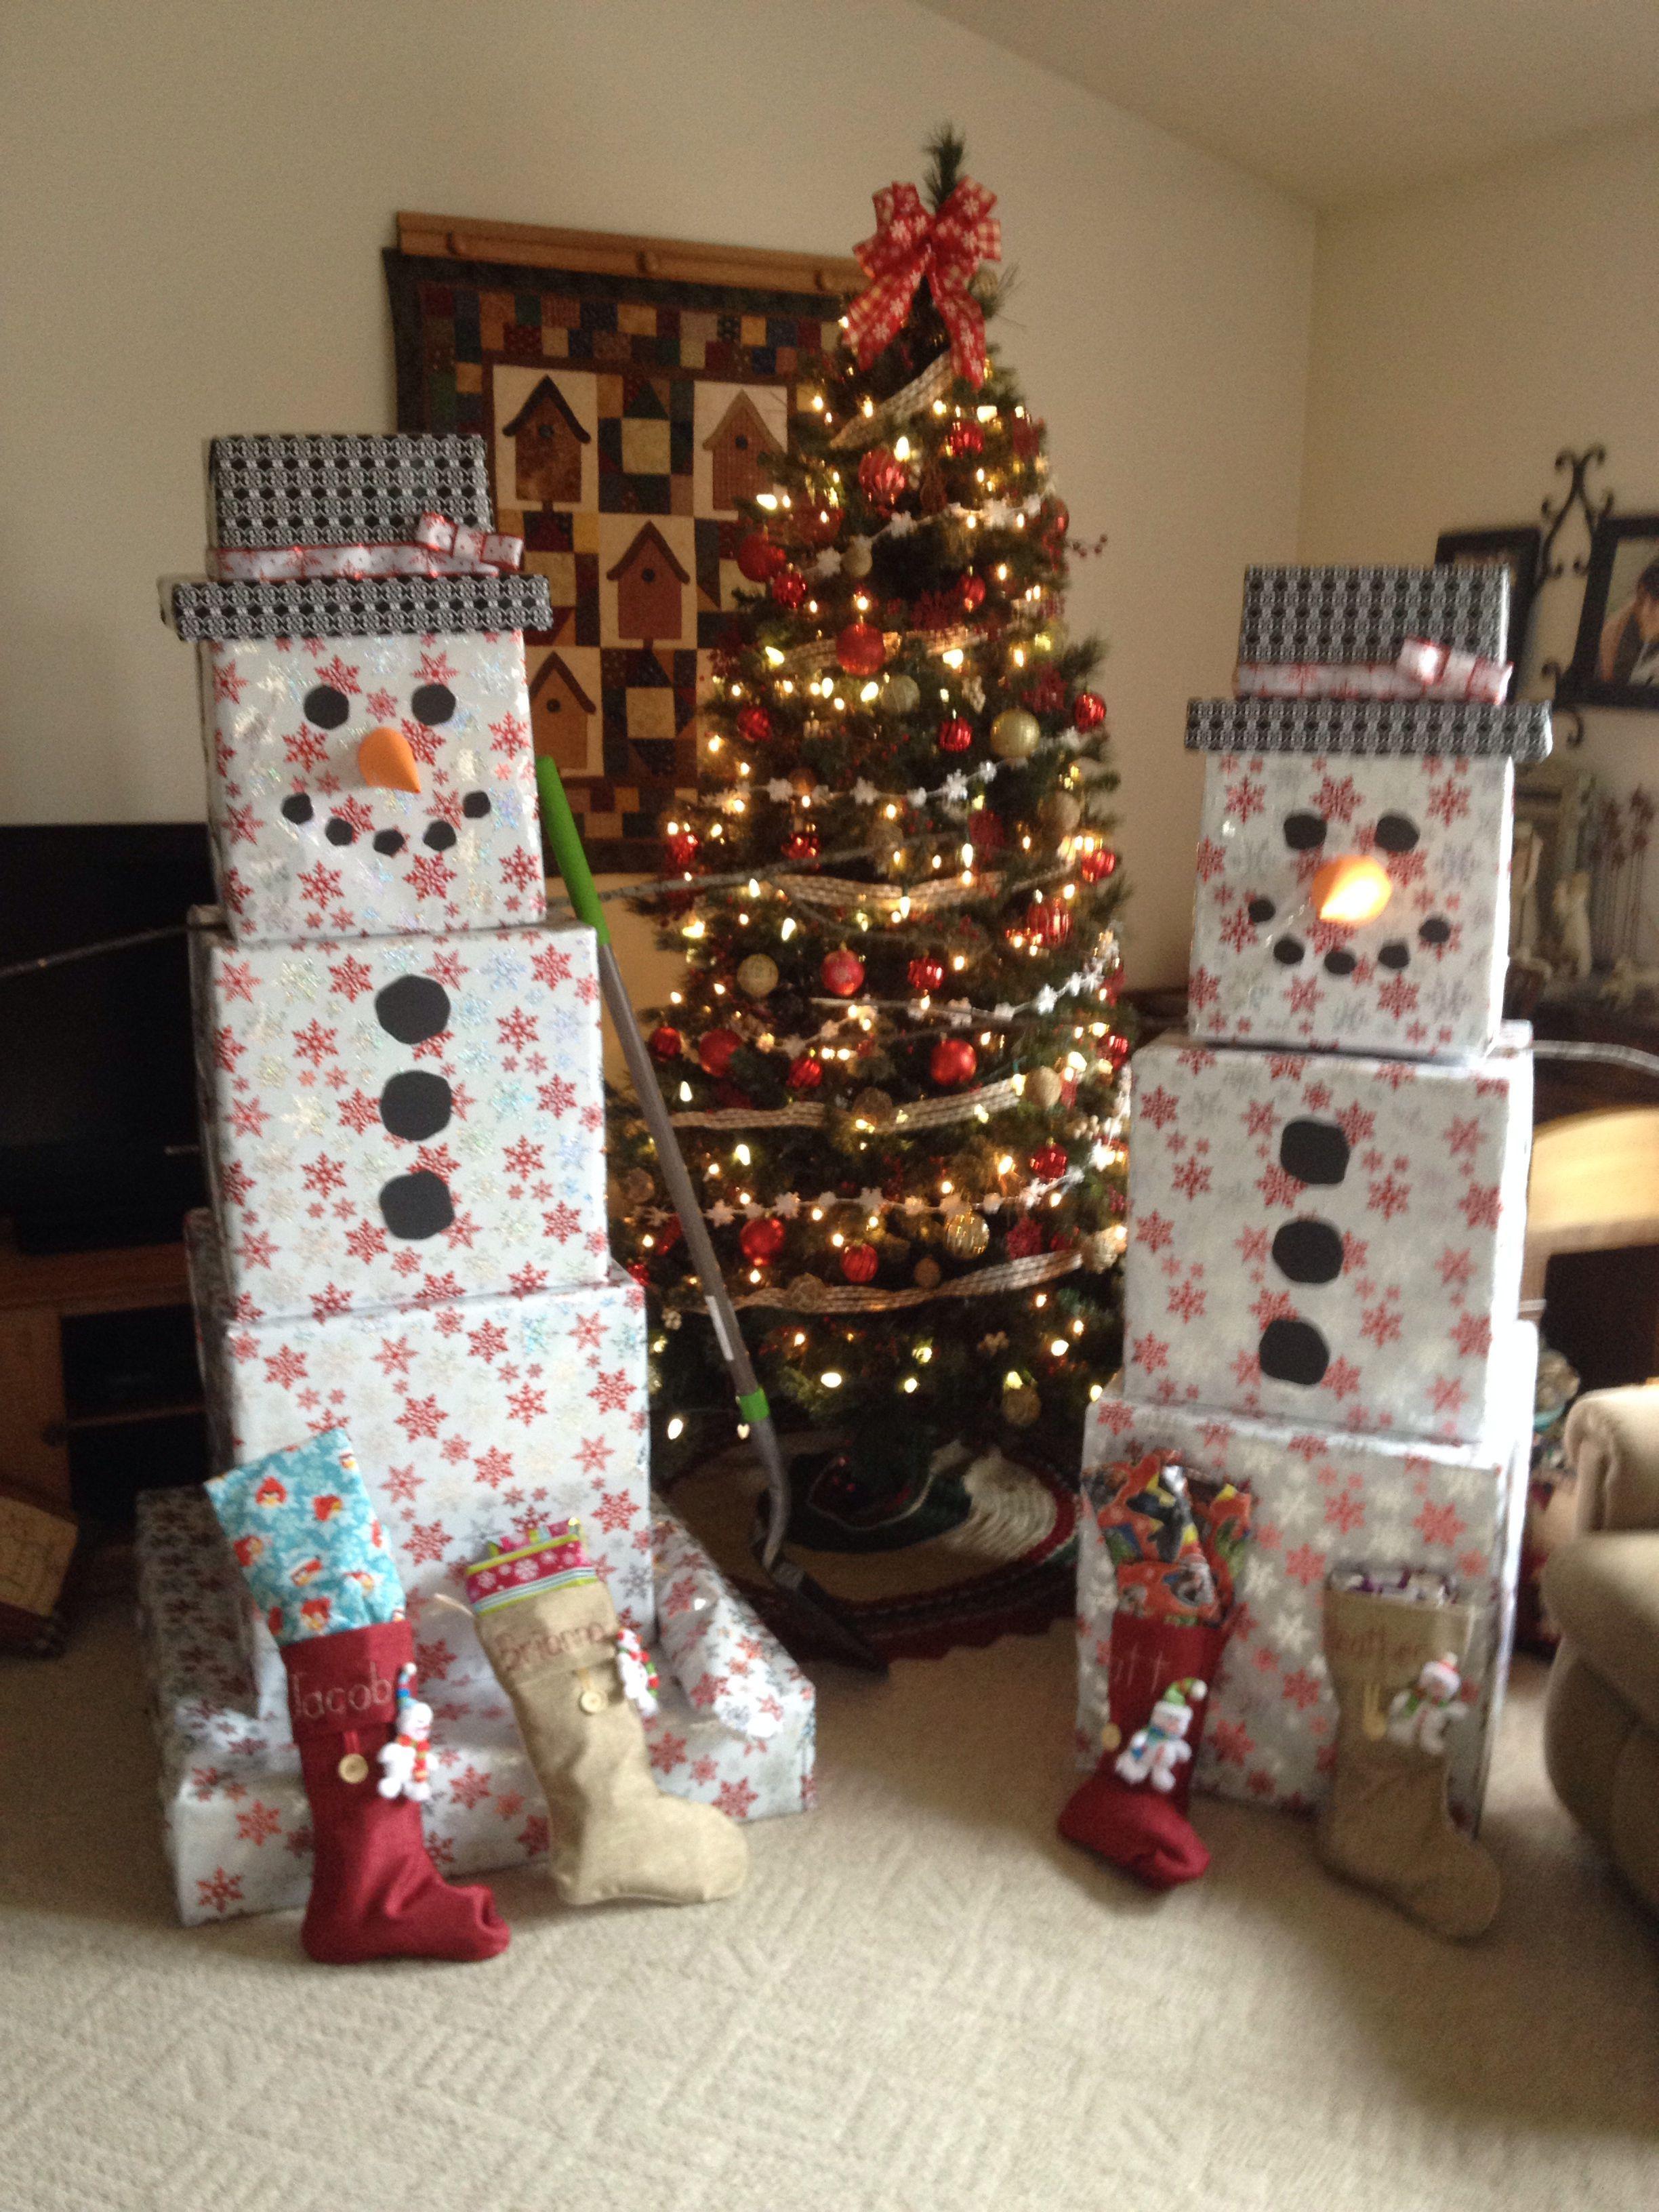 Snowman Gift Towers Keep Christmas Gifts Minimal And Fun